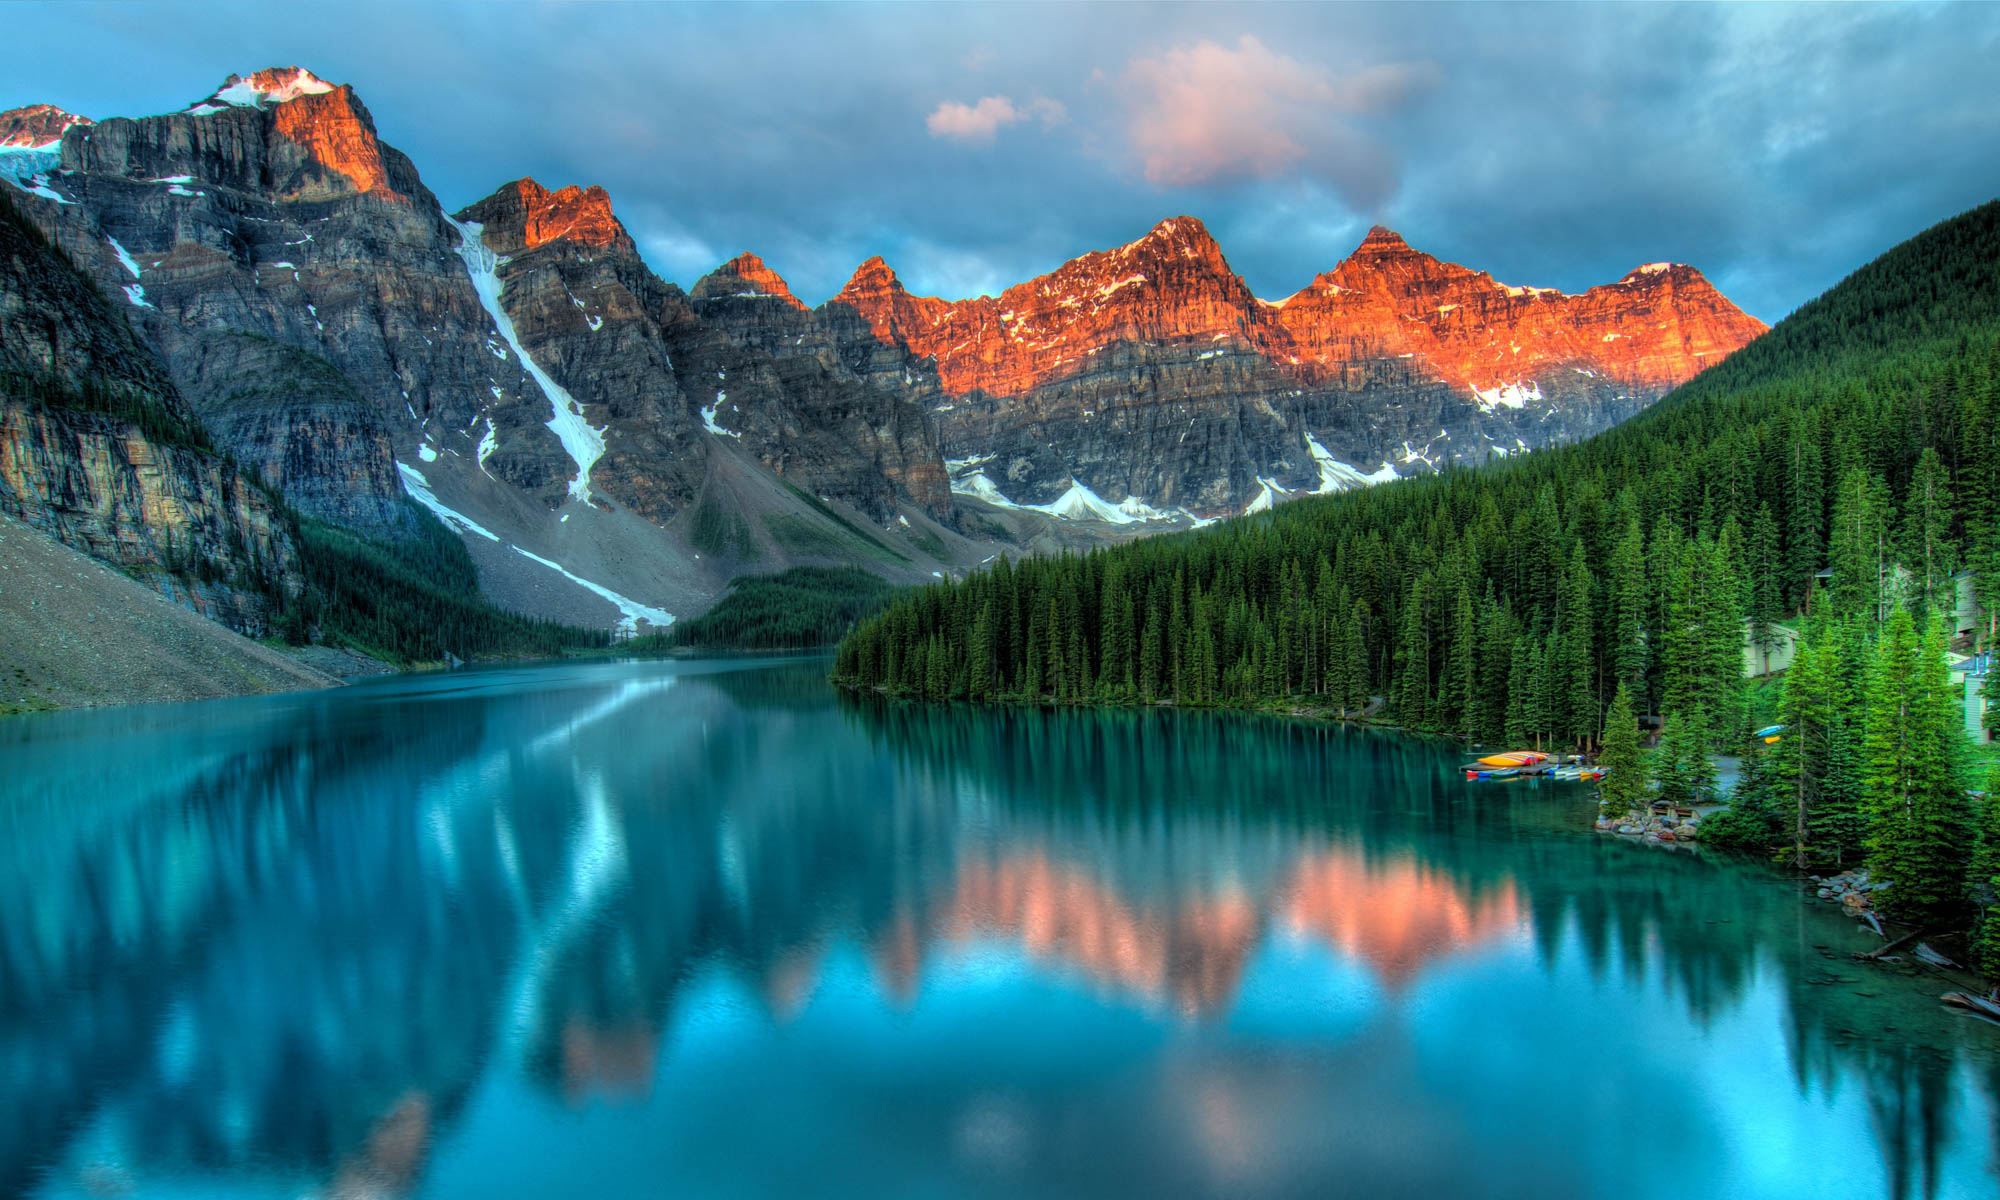 Canadian mountain range in Alberta with sun kissed peaks